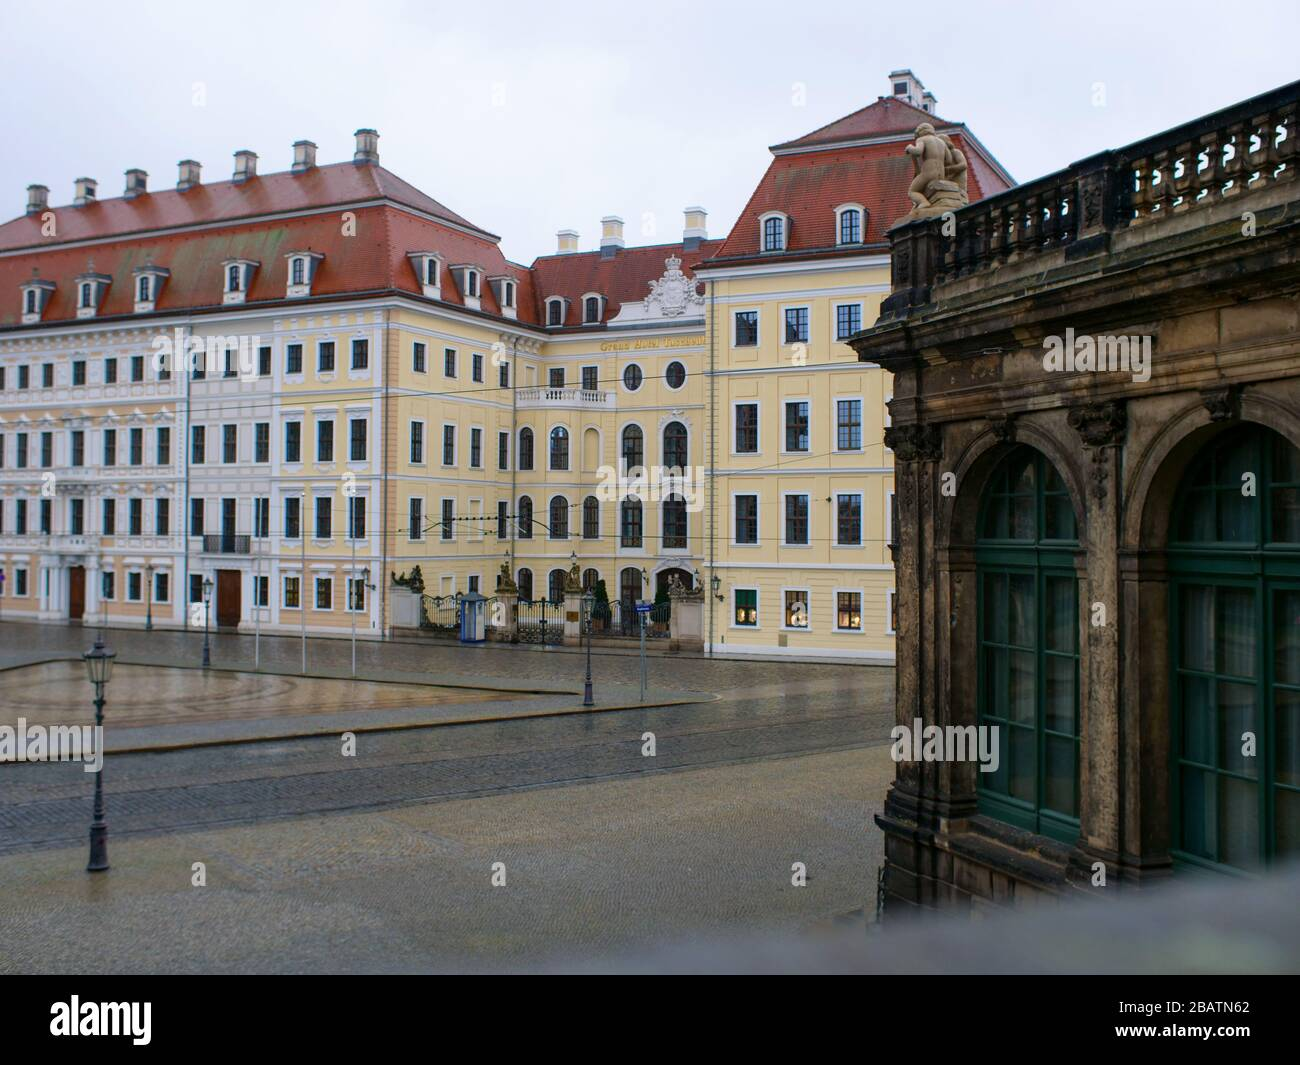 Hotel Taschenbergpalais in Dresden Kempinski Luxushotel während Coronavirus Lockdown 2020 bei Regen Stock Photo